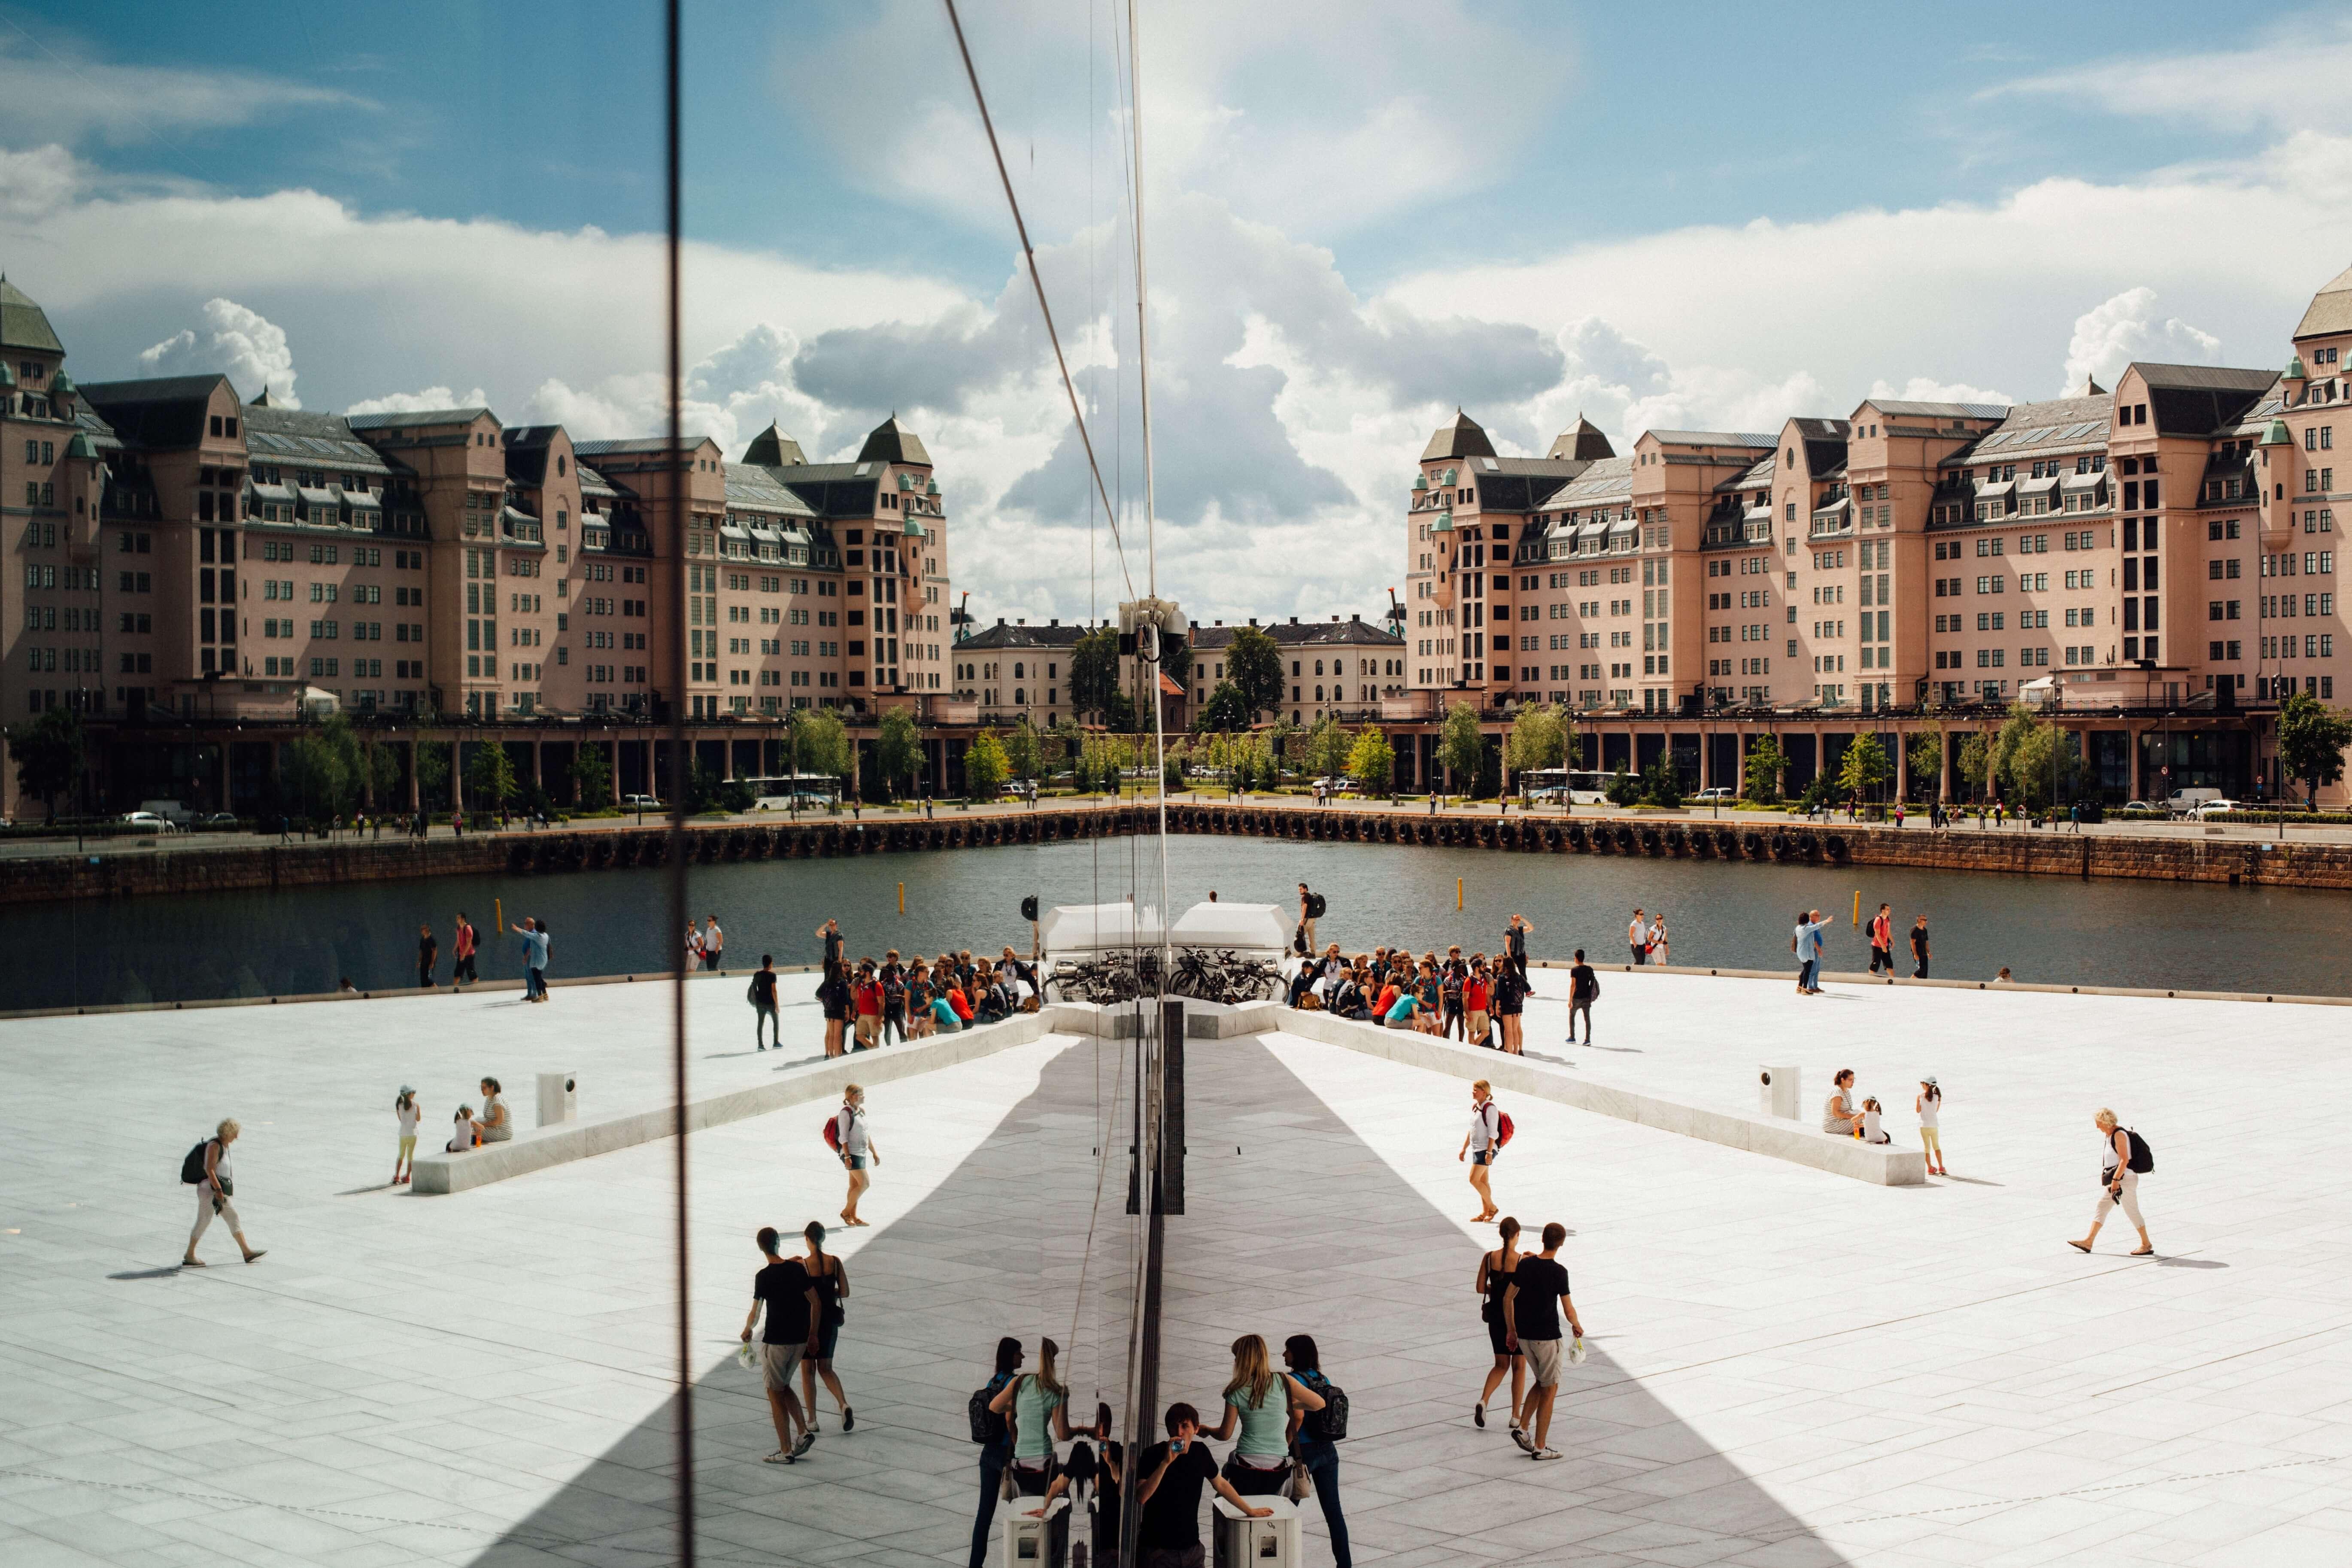 Oslo harbourfront